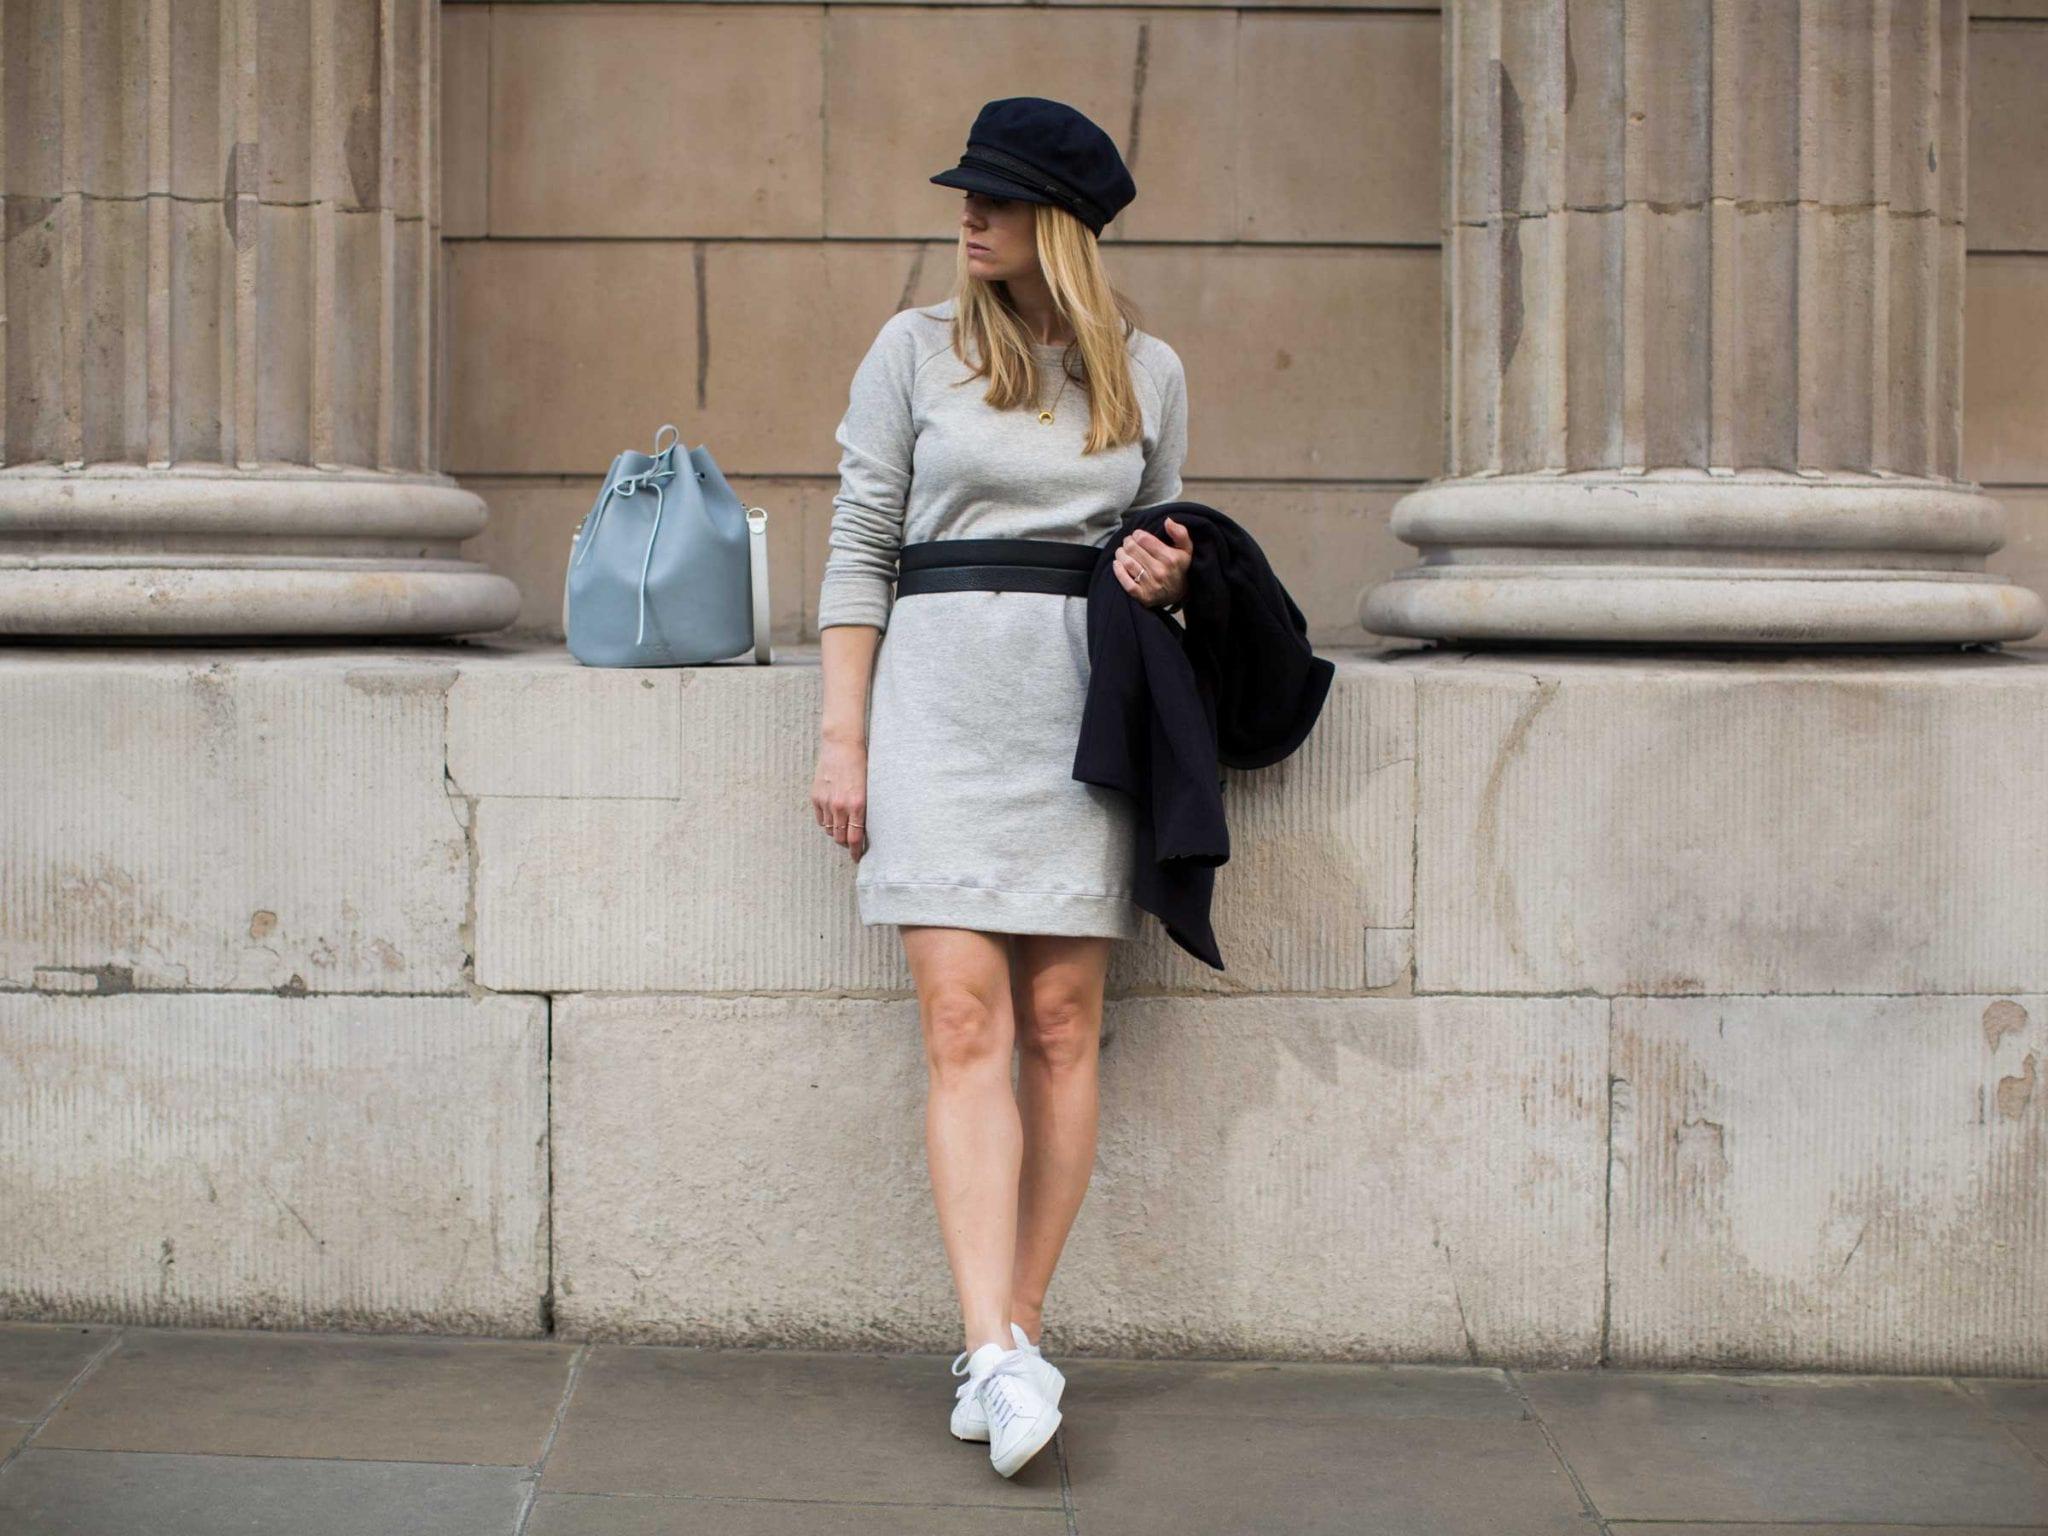 Style&Minimalism | It's Personal | Armor Lux Pea Coat, Bon Label Grey Sweatshirt Dress, Common Projects & Baia Bucket Bag